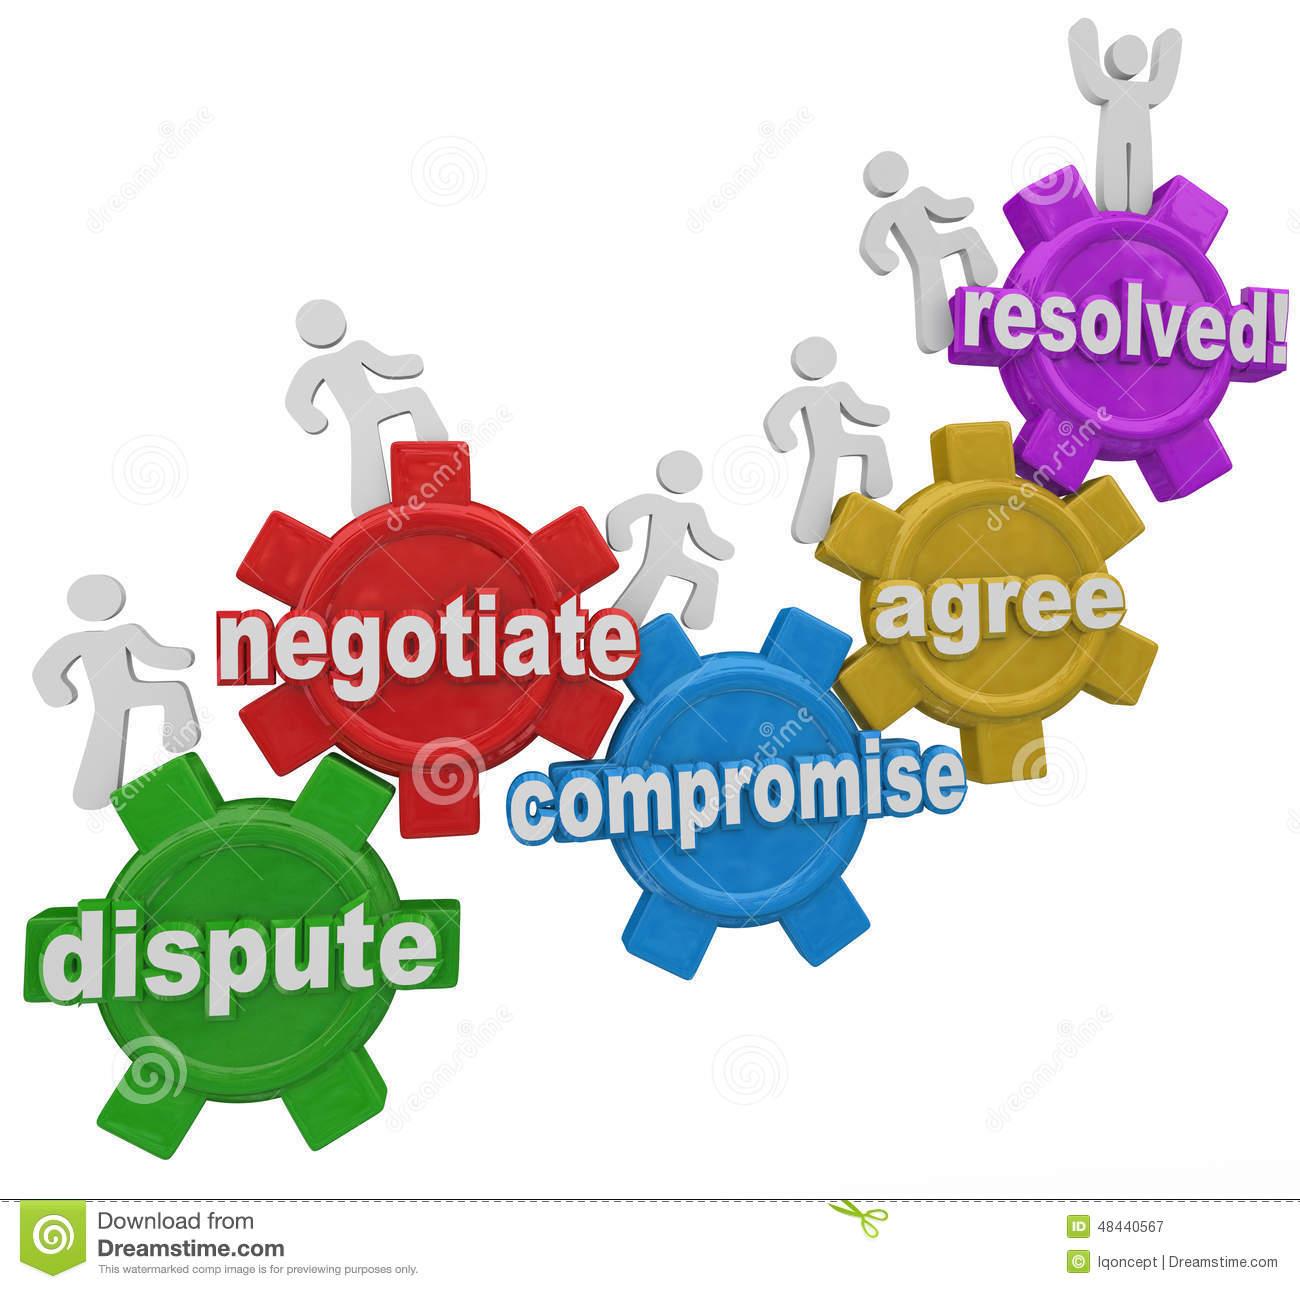 Compromise Dispute Negotiation.